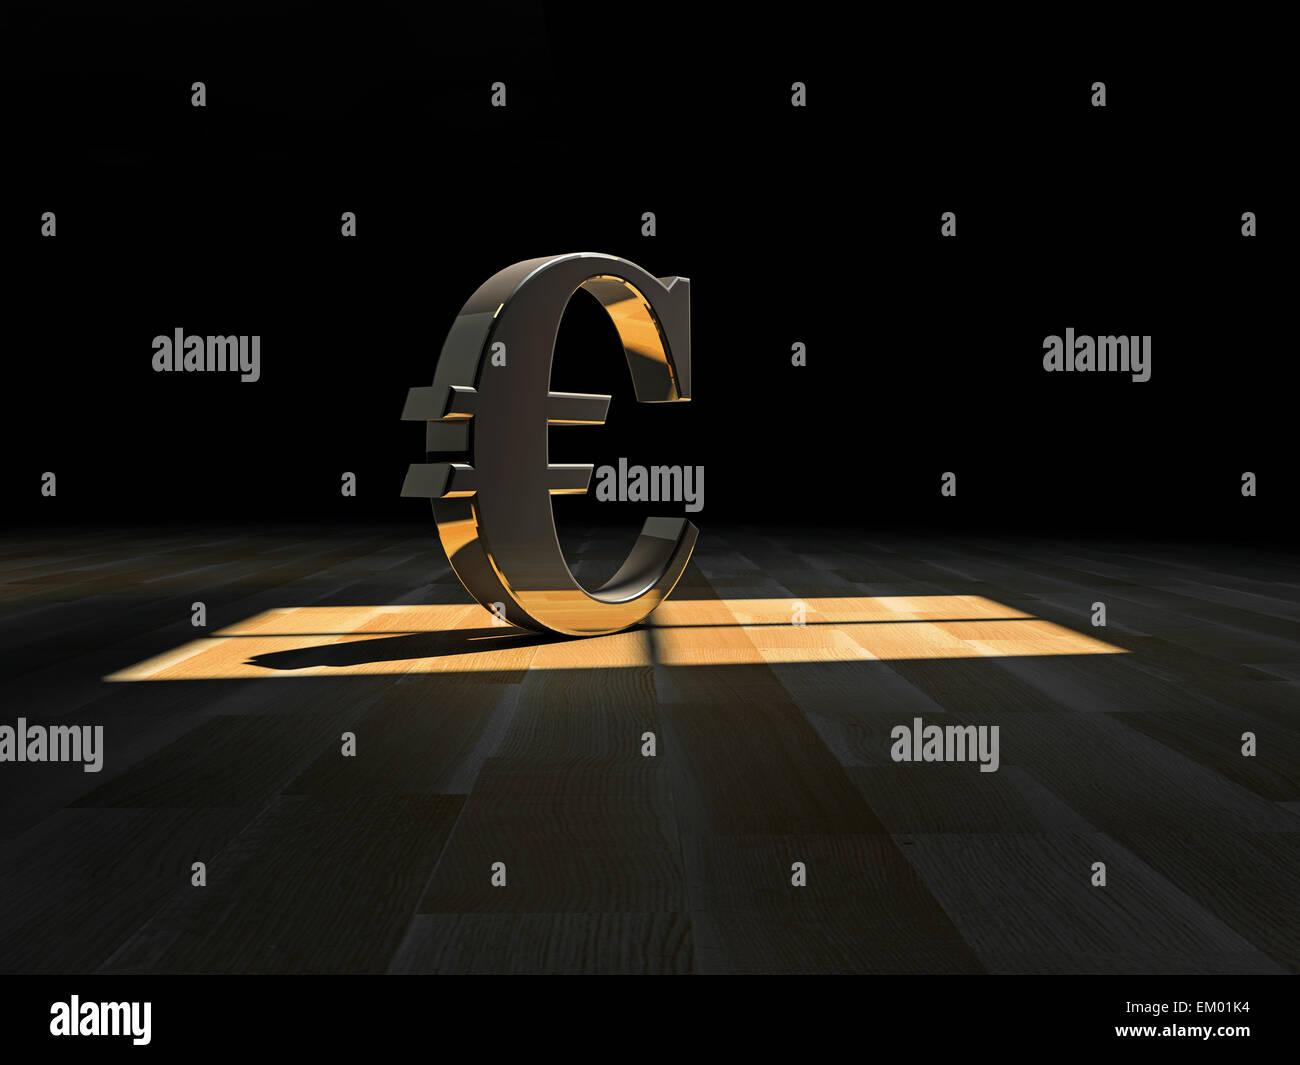 Euro symbol - Stock Image